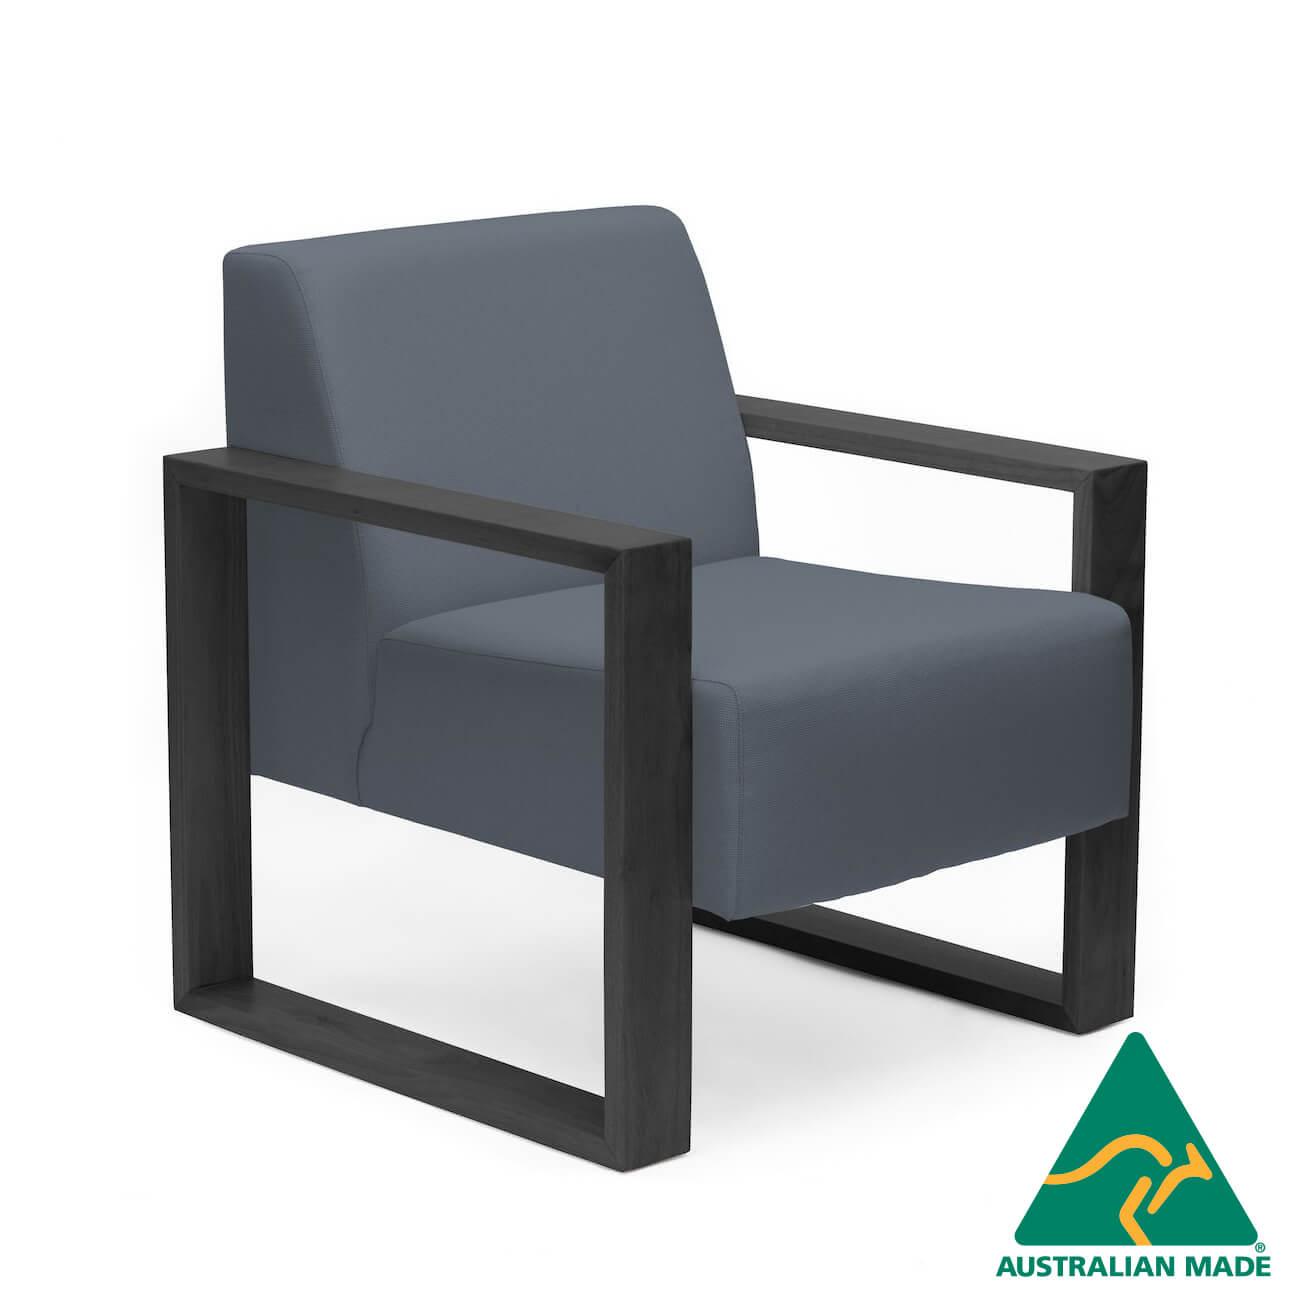 malibu-single-seater-black-timber-frame